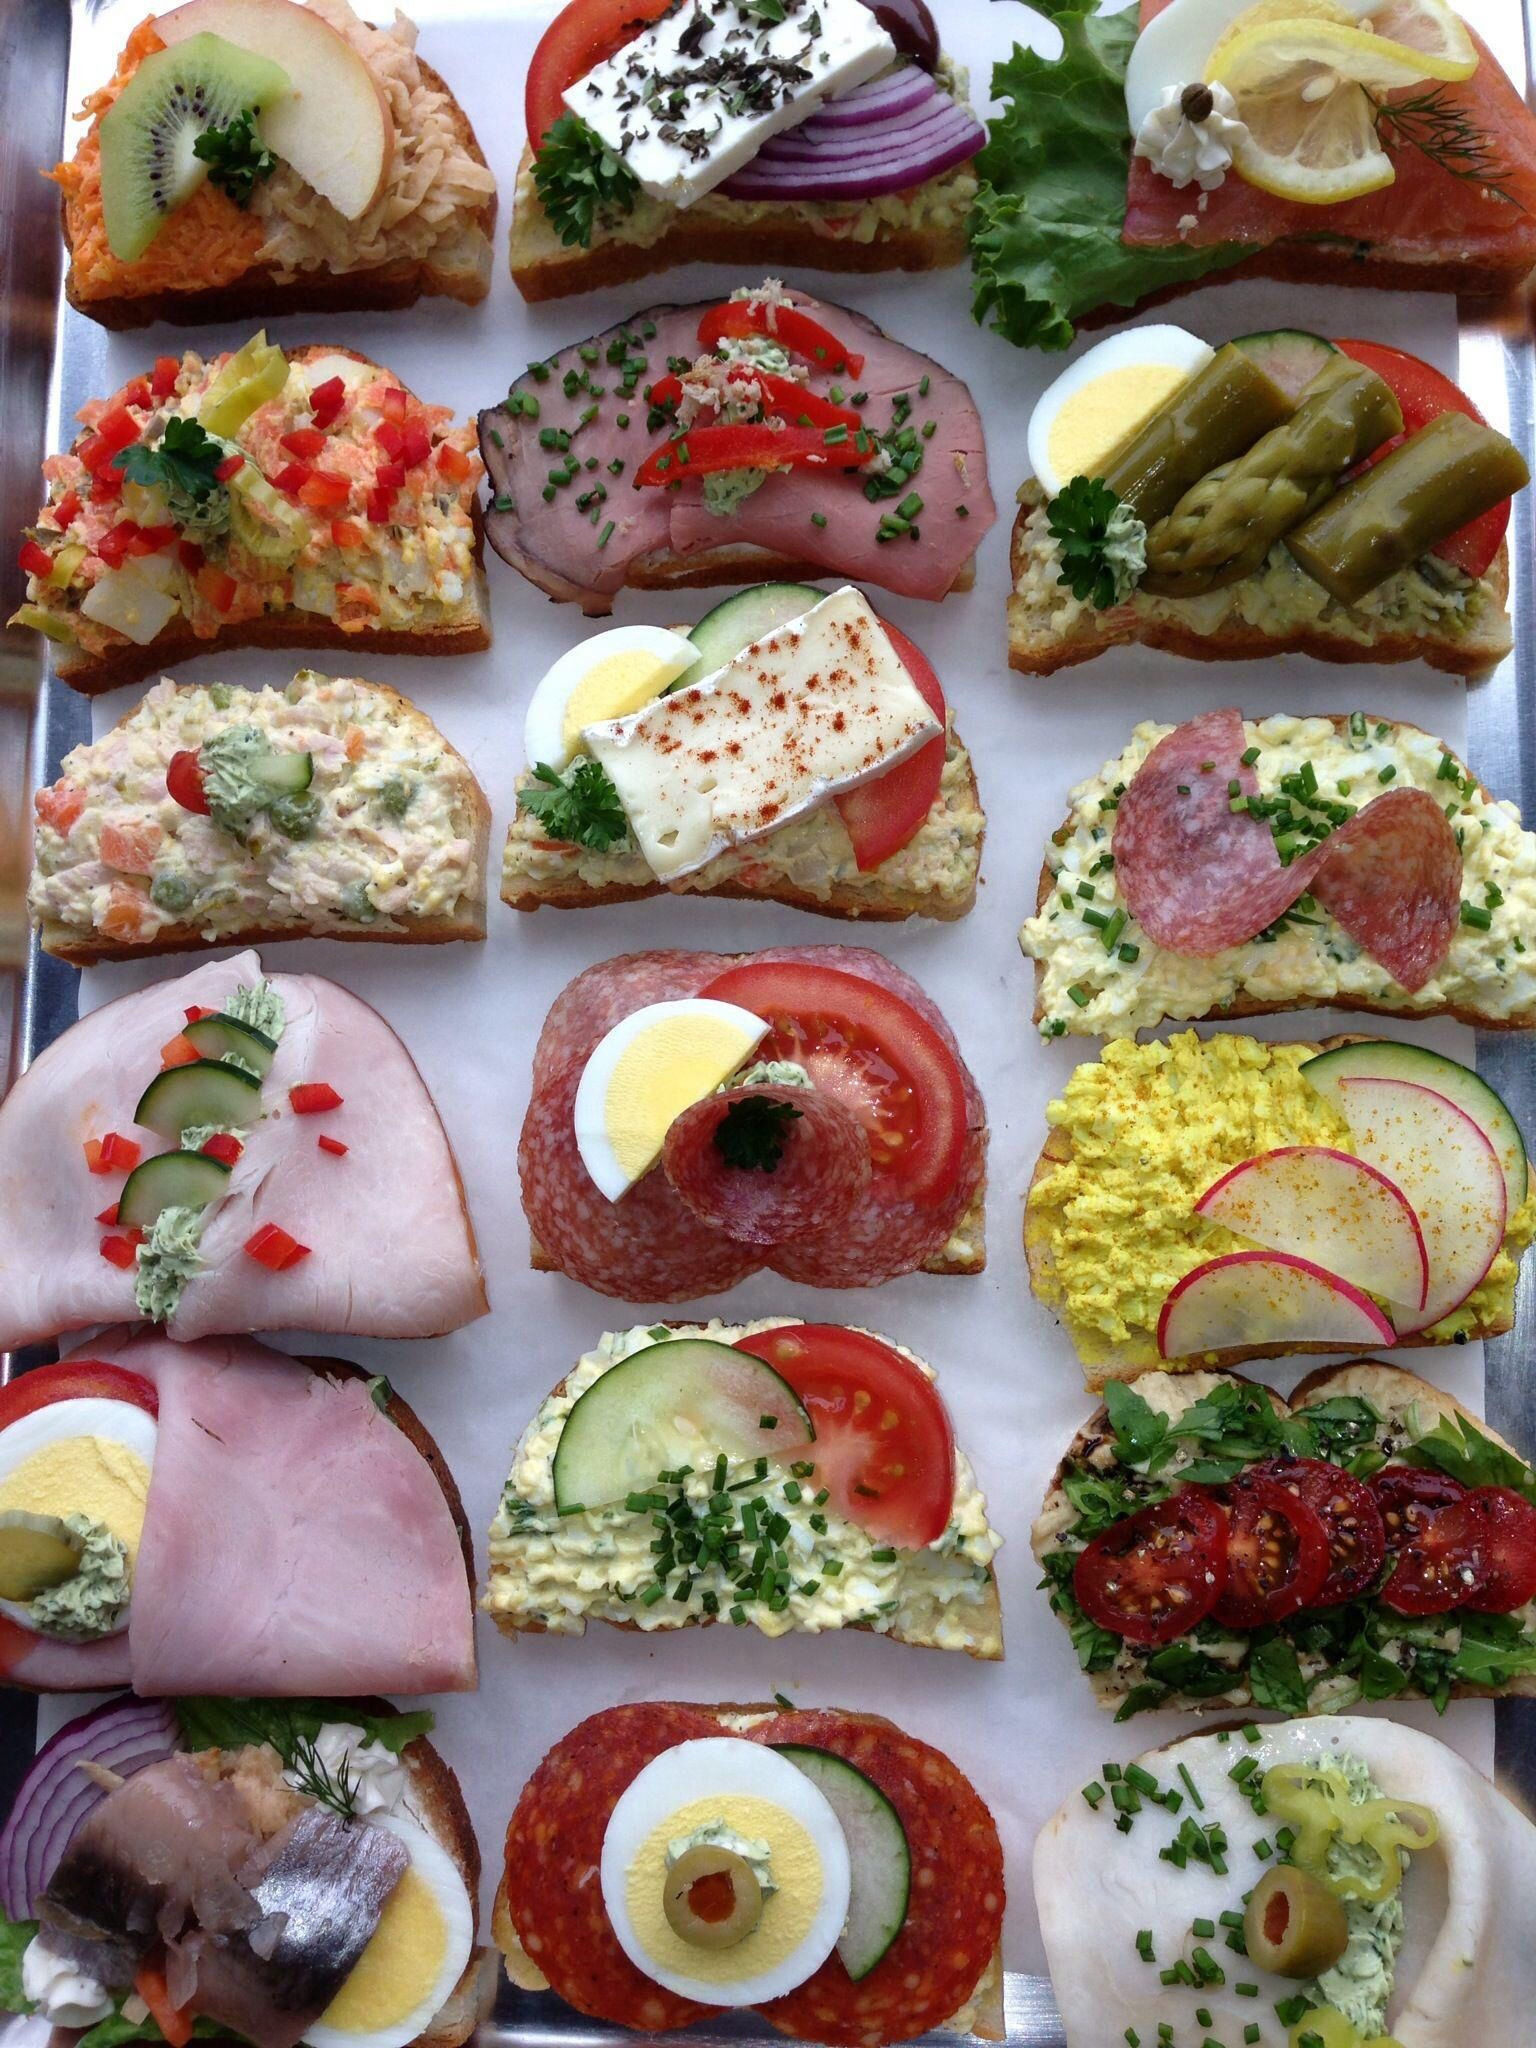 Open face Danish sandwiches